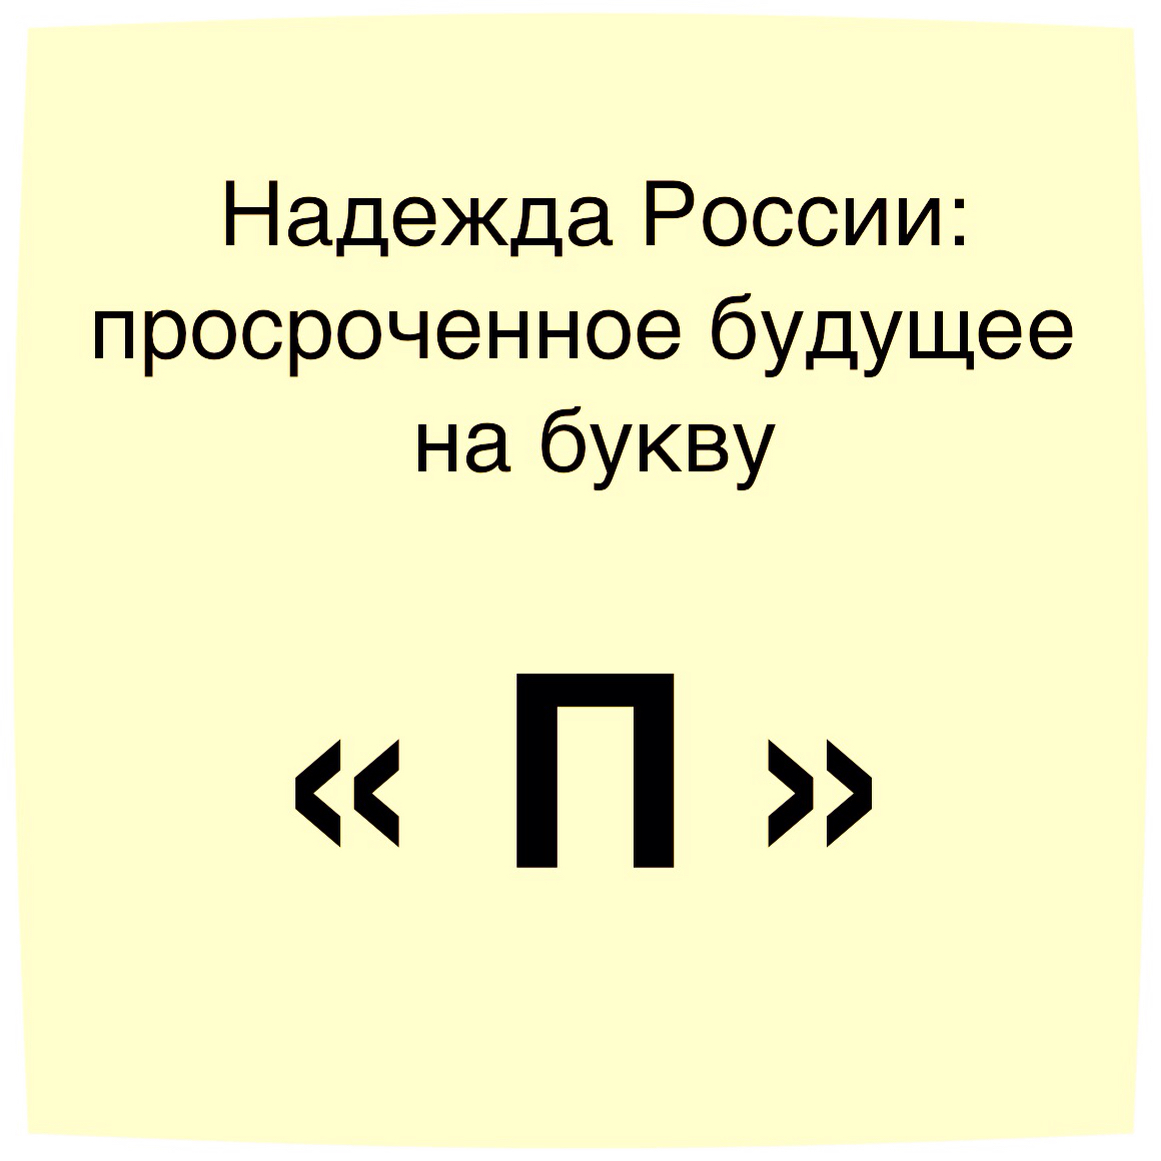 Анекдот Про Букву П